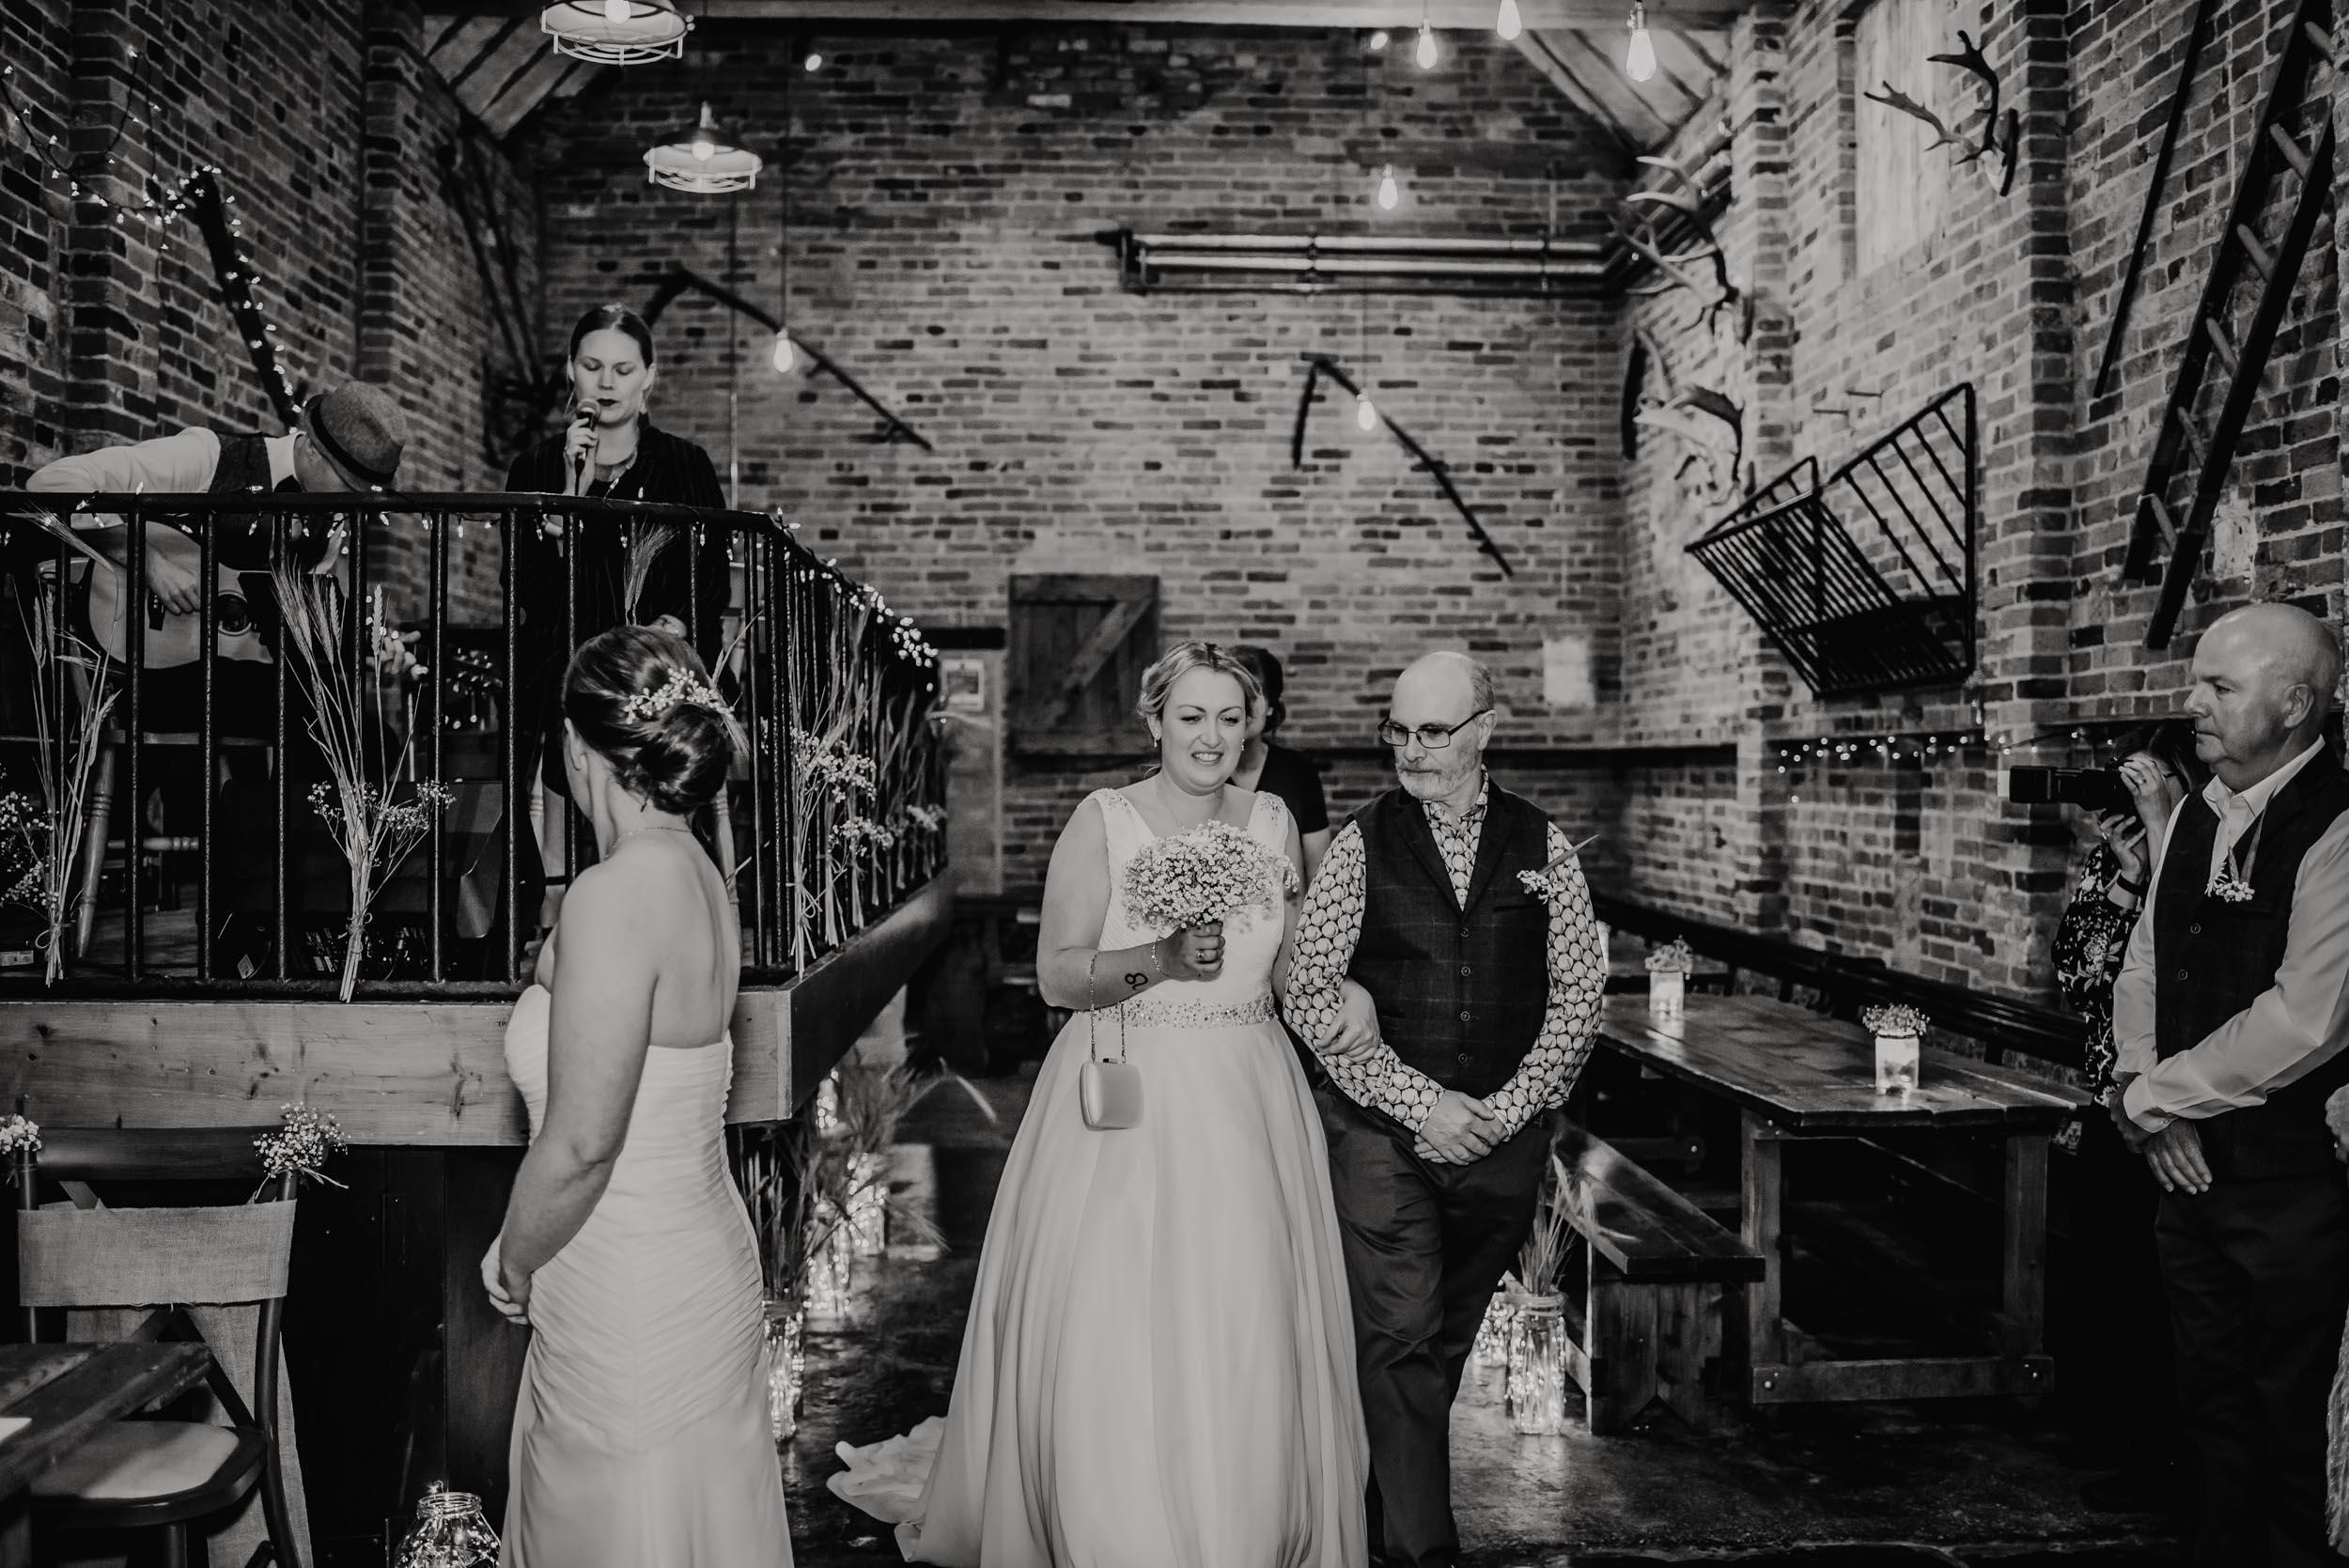 Donington-park-farm-wedding-photography-116.jpg